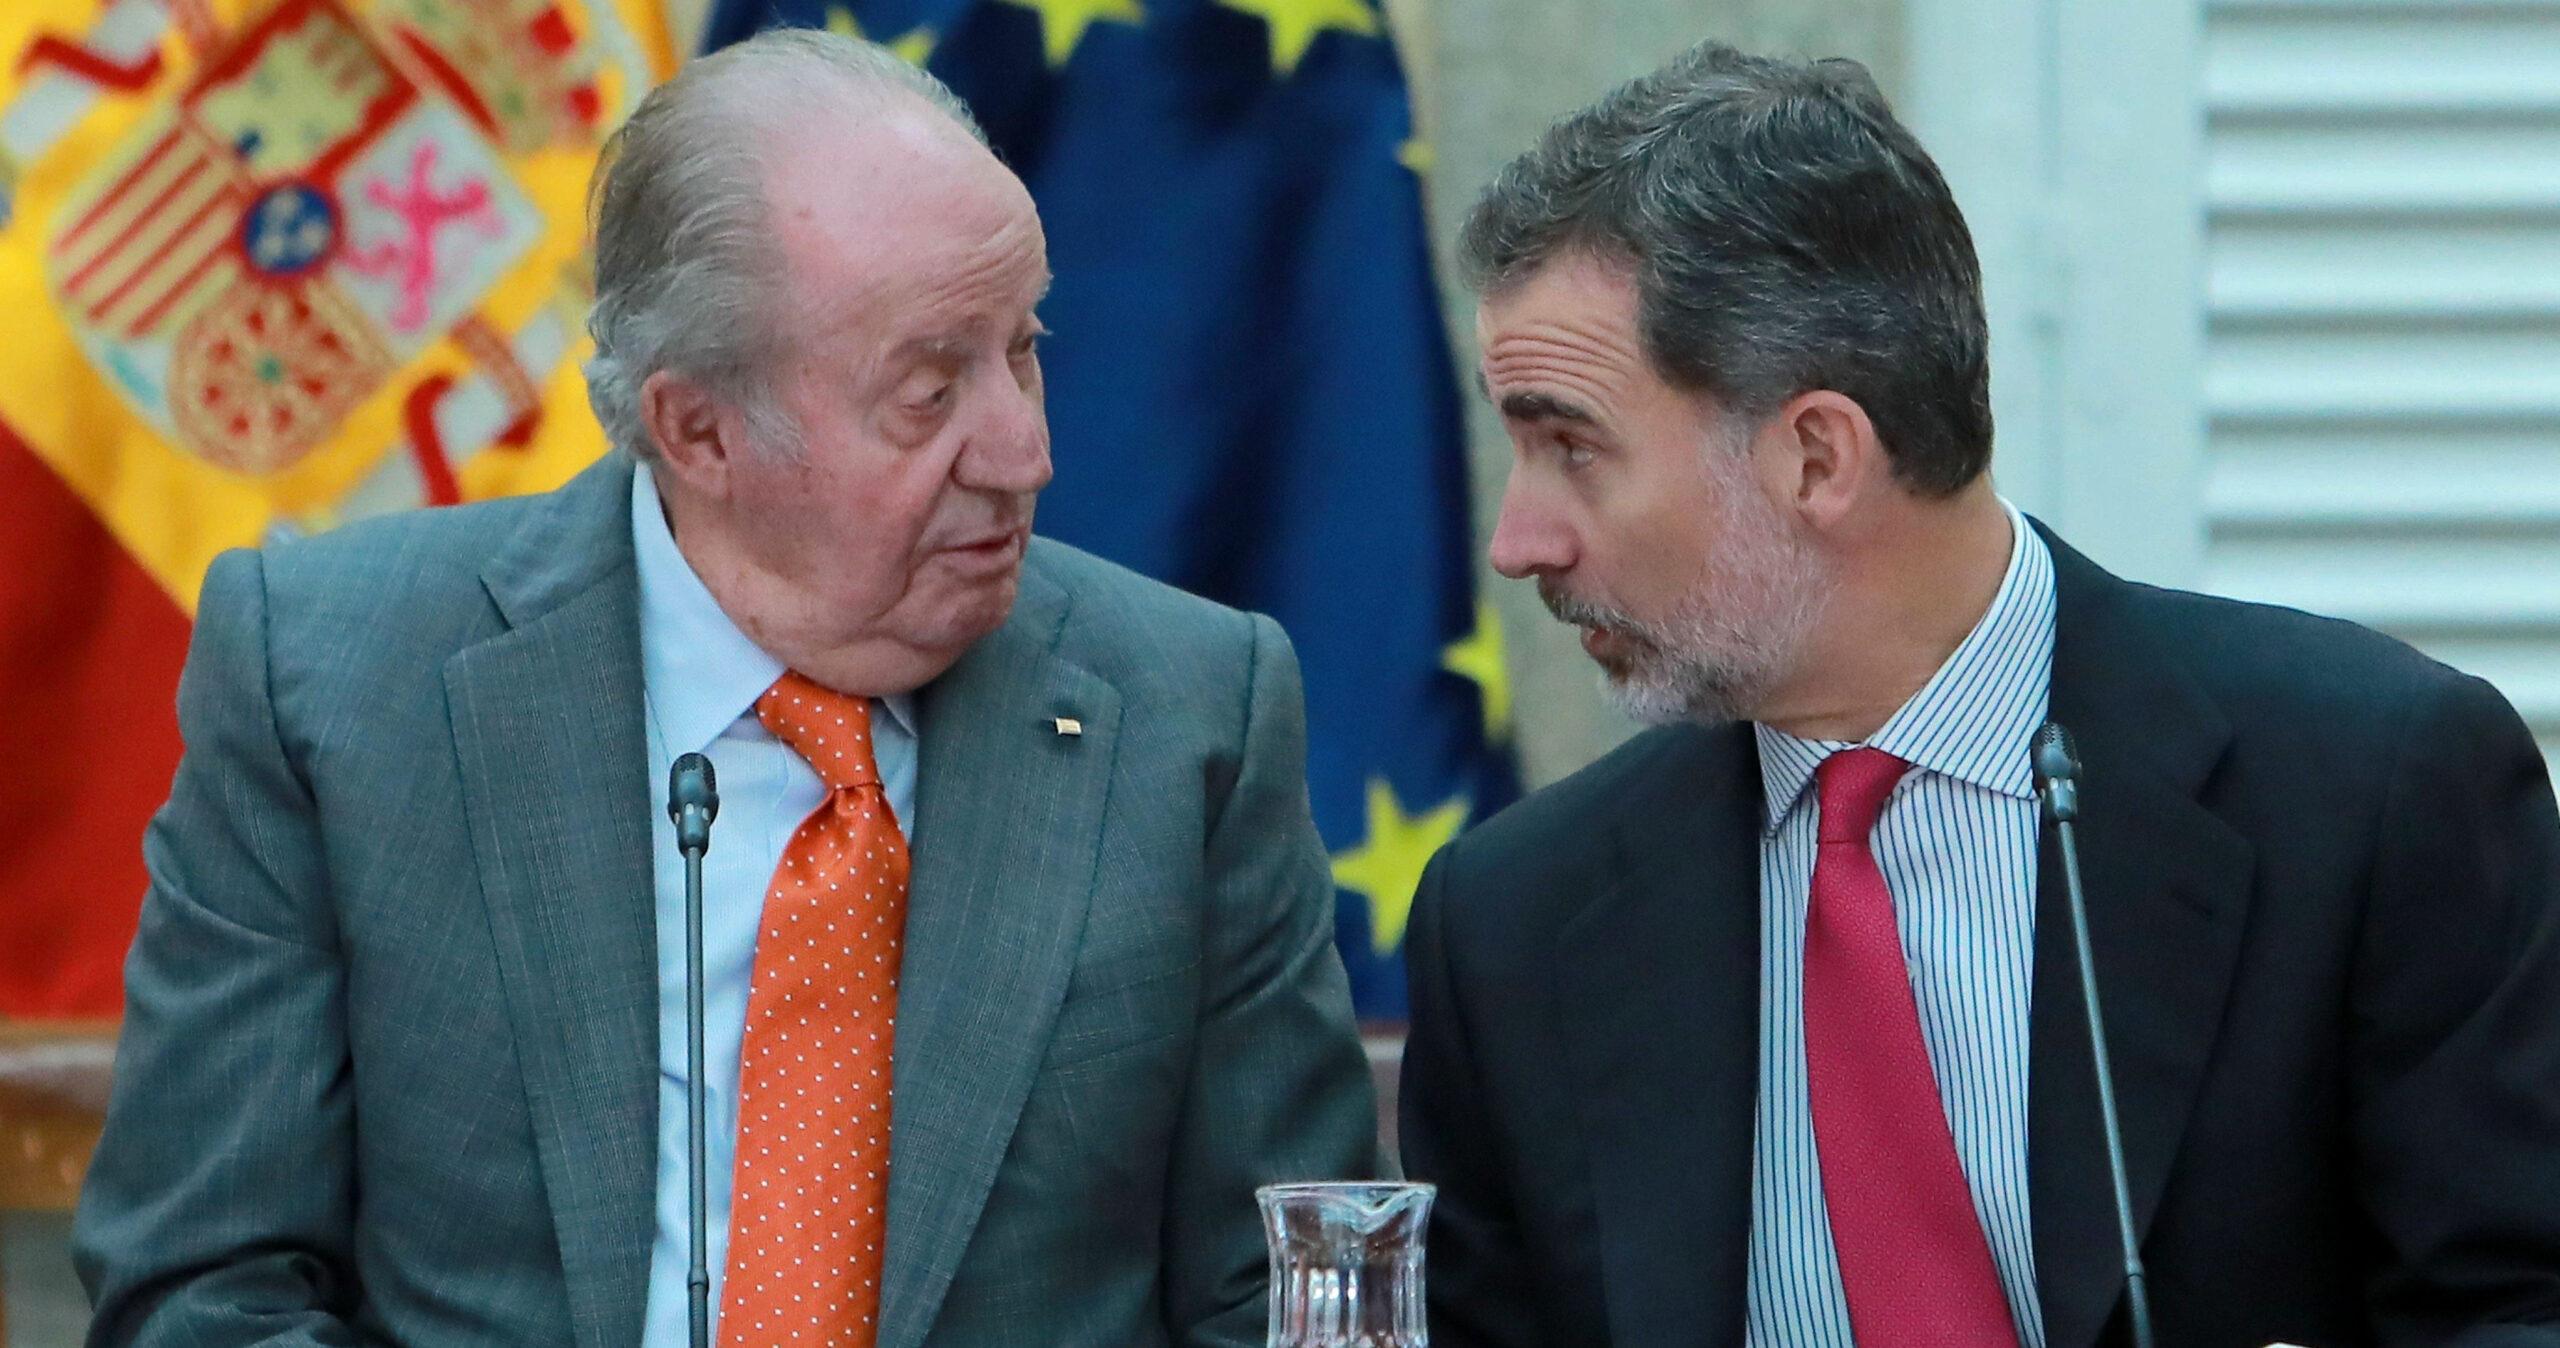 Joan Carles i Felip / Europa Press